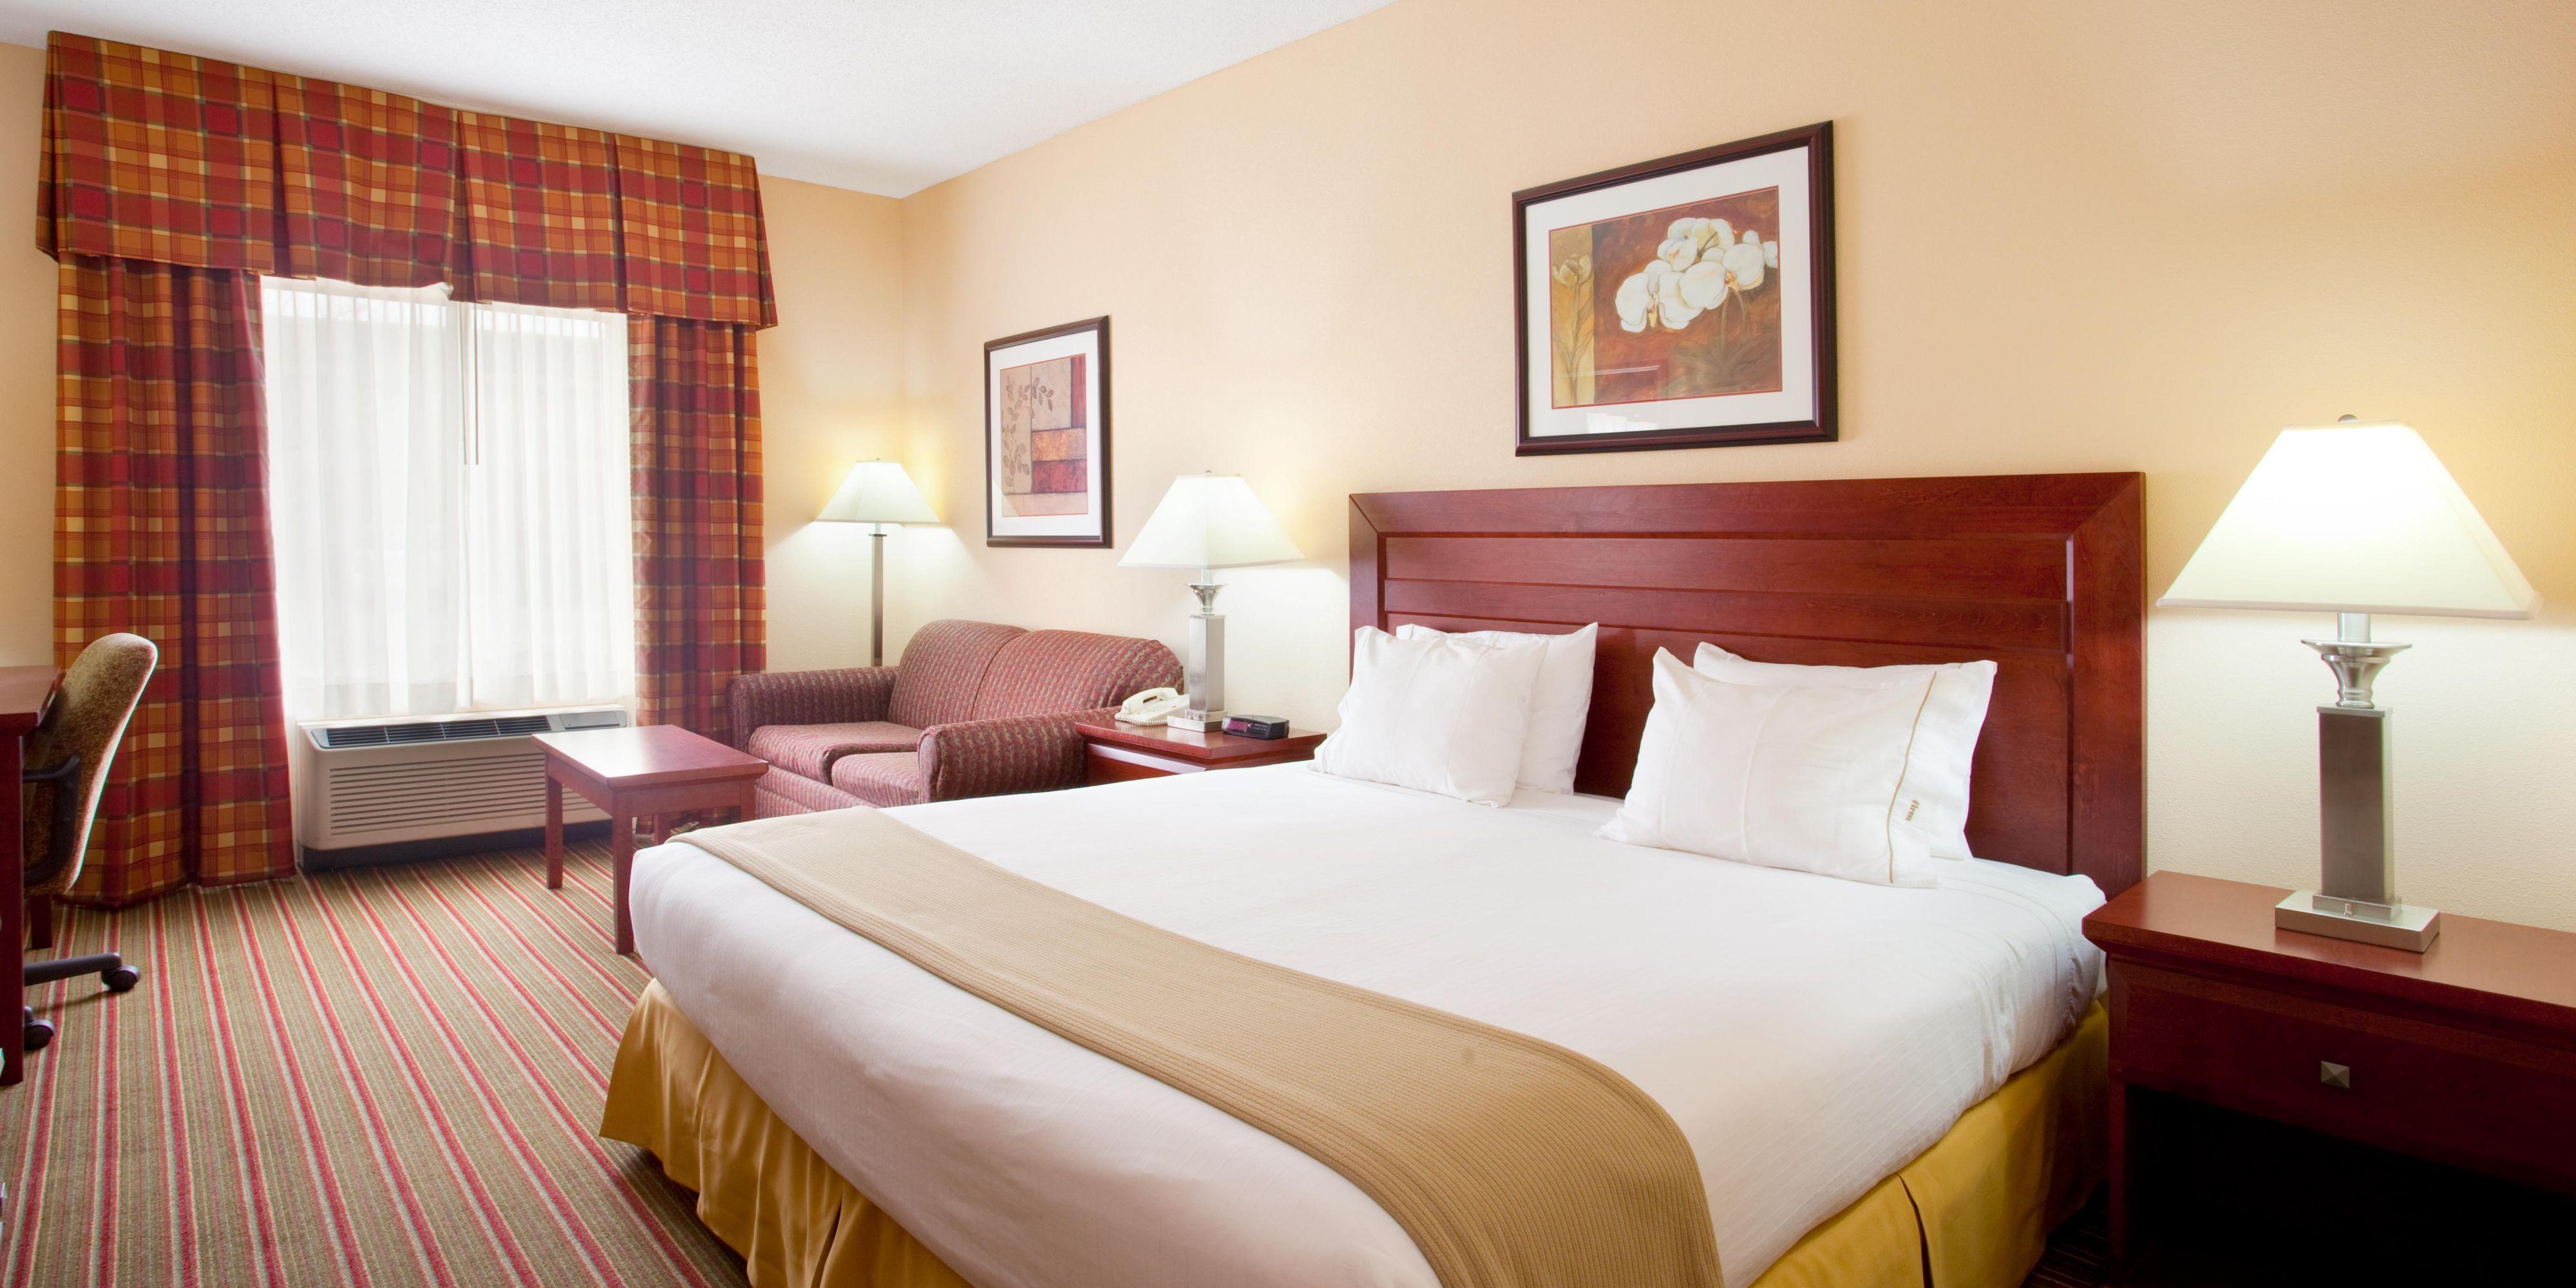 Holiday Inn Express And Suites Bourbonnais 4281724236 2x1